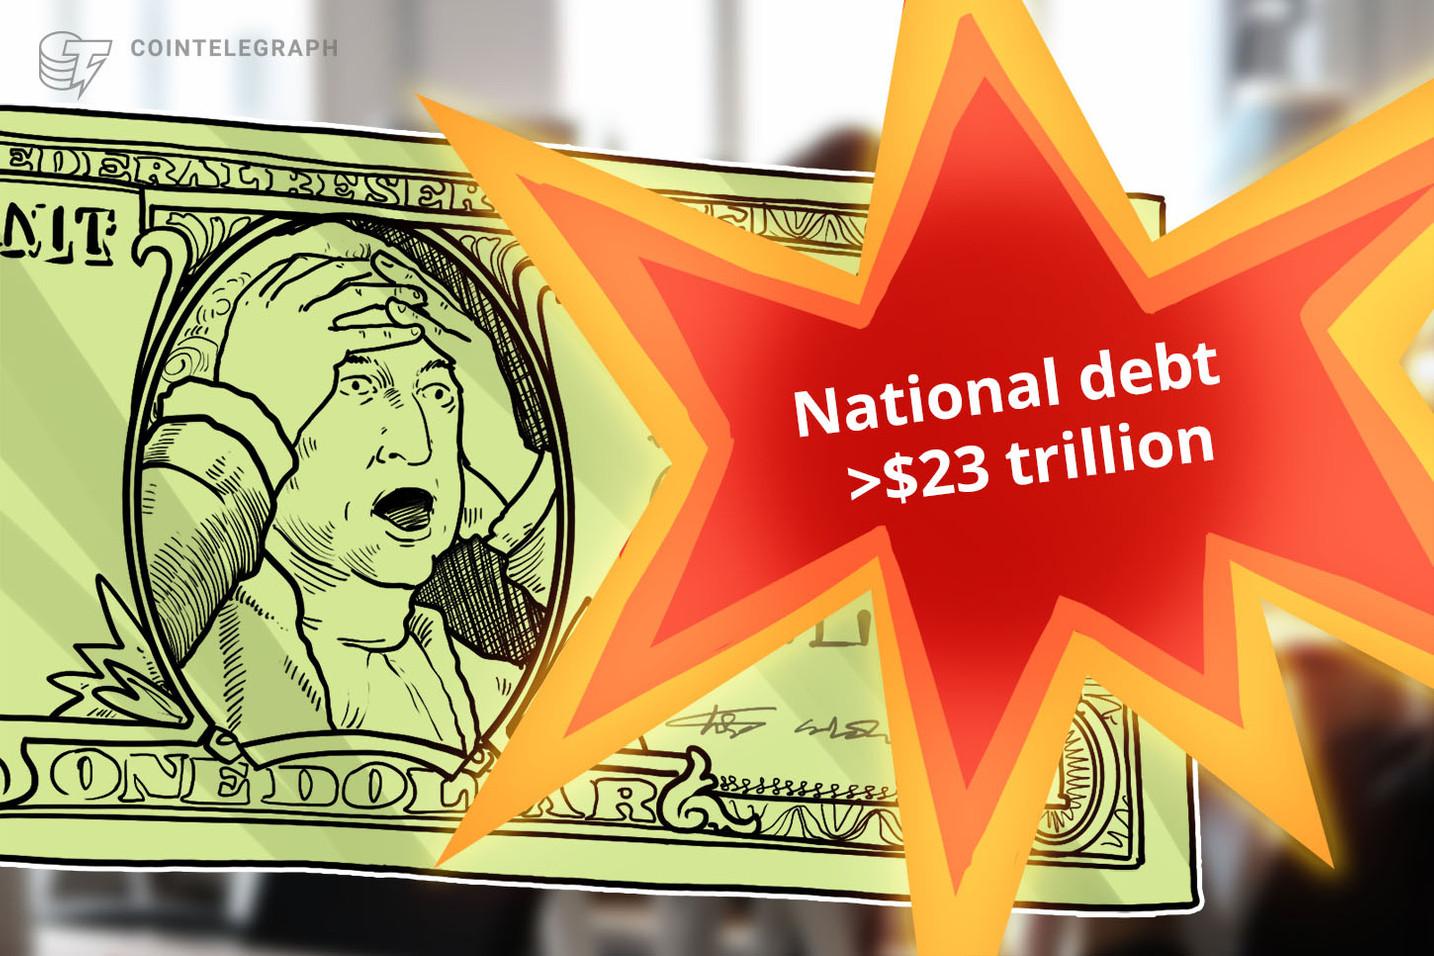 United States National Debt Hits 23 Trillion — Over $1M Per Bitcoin